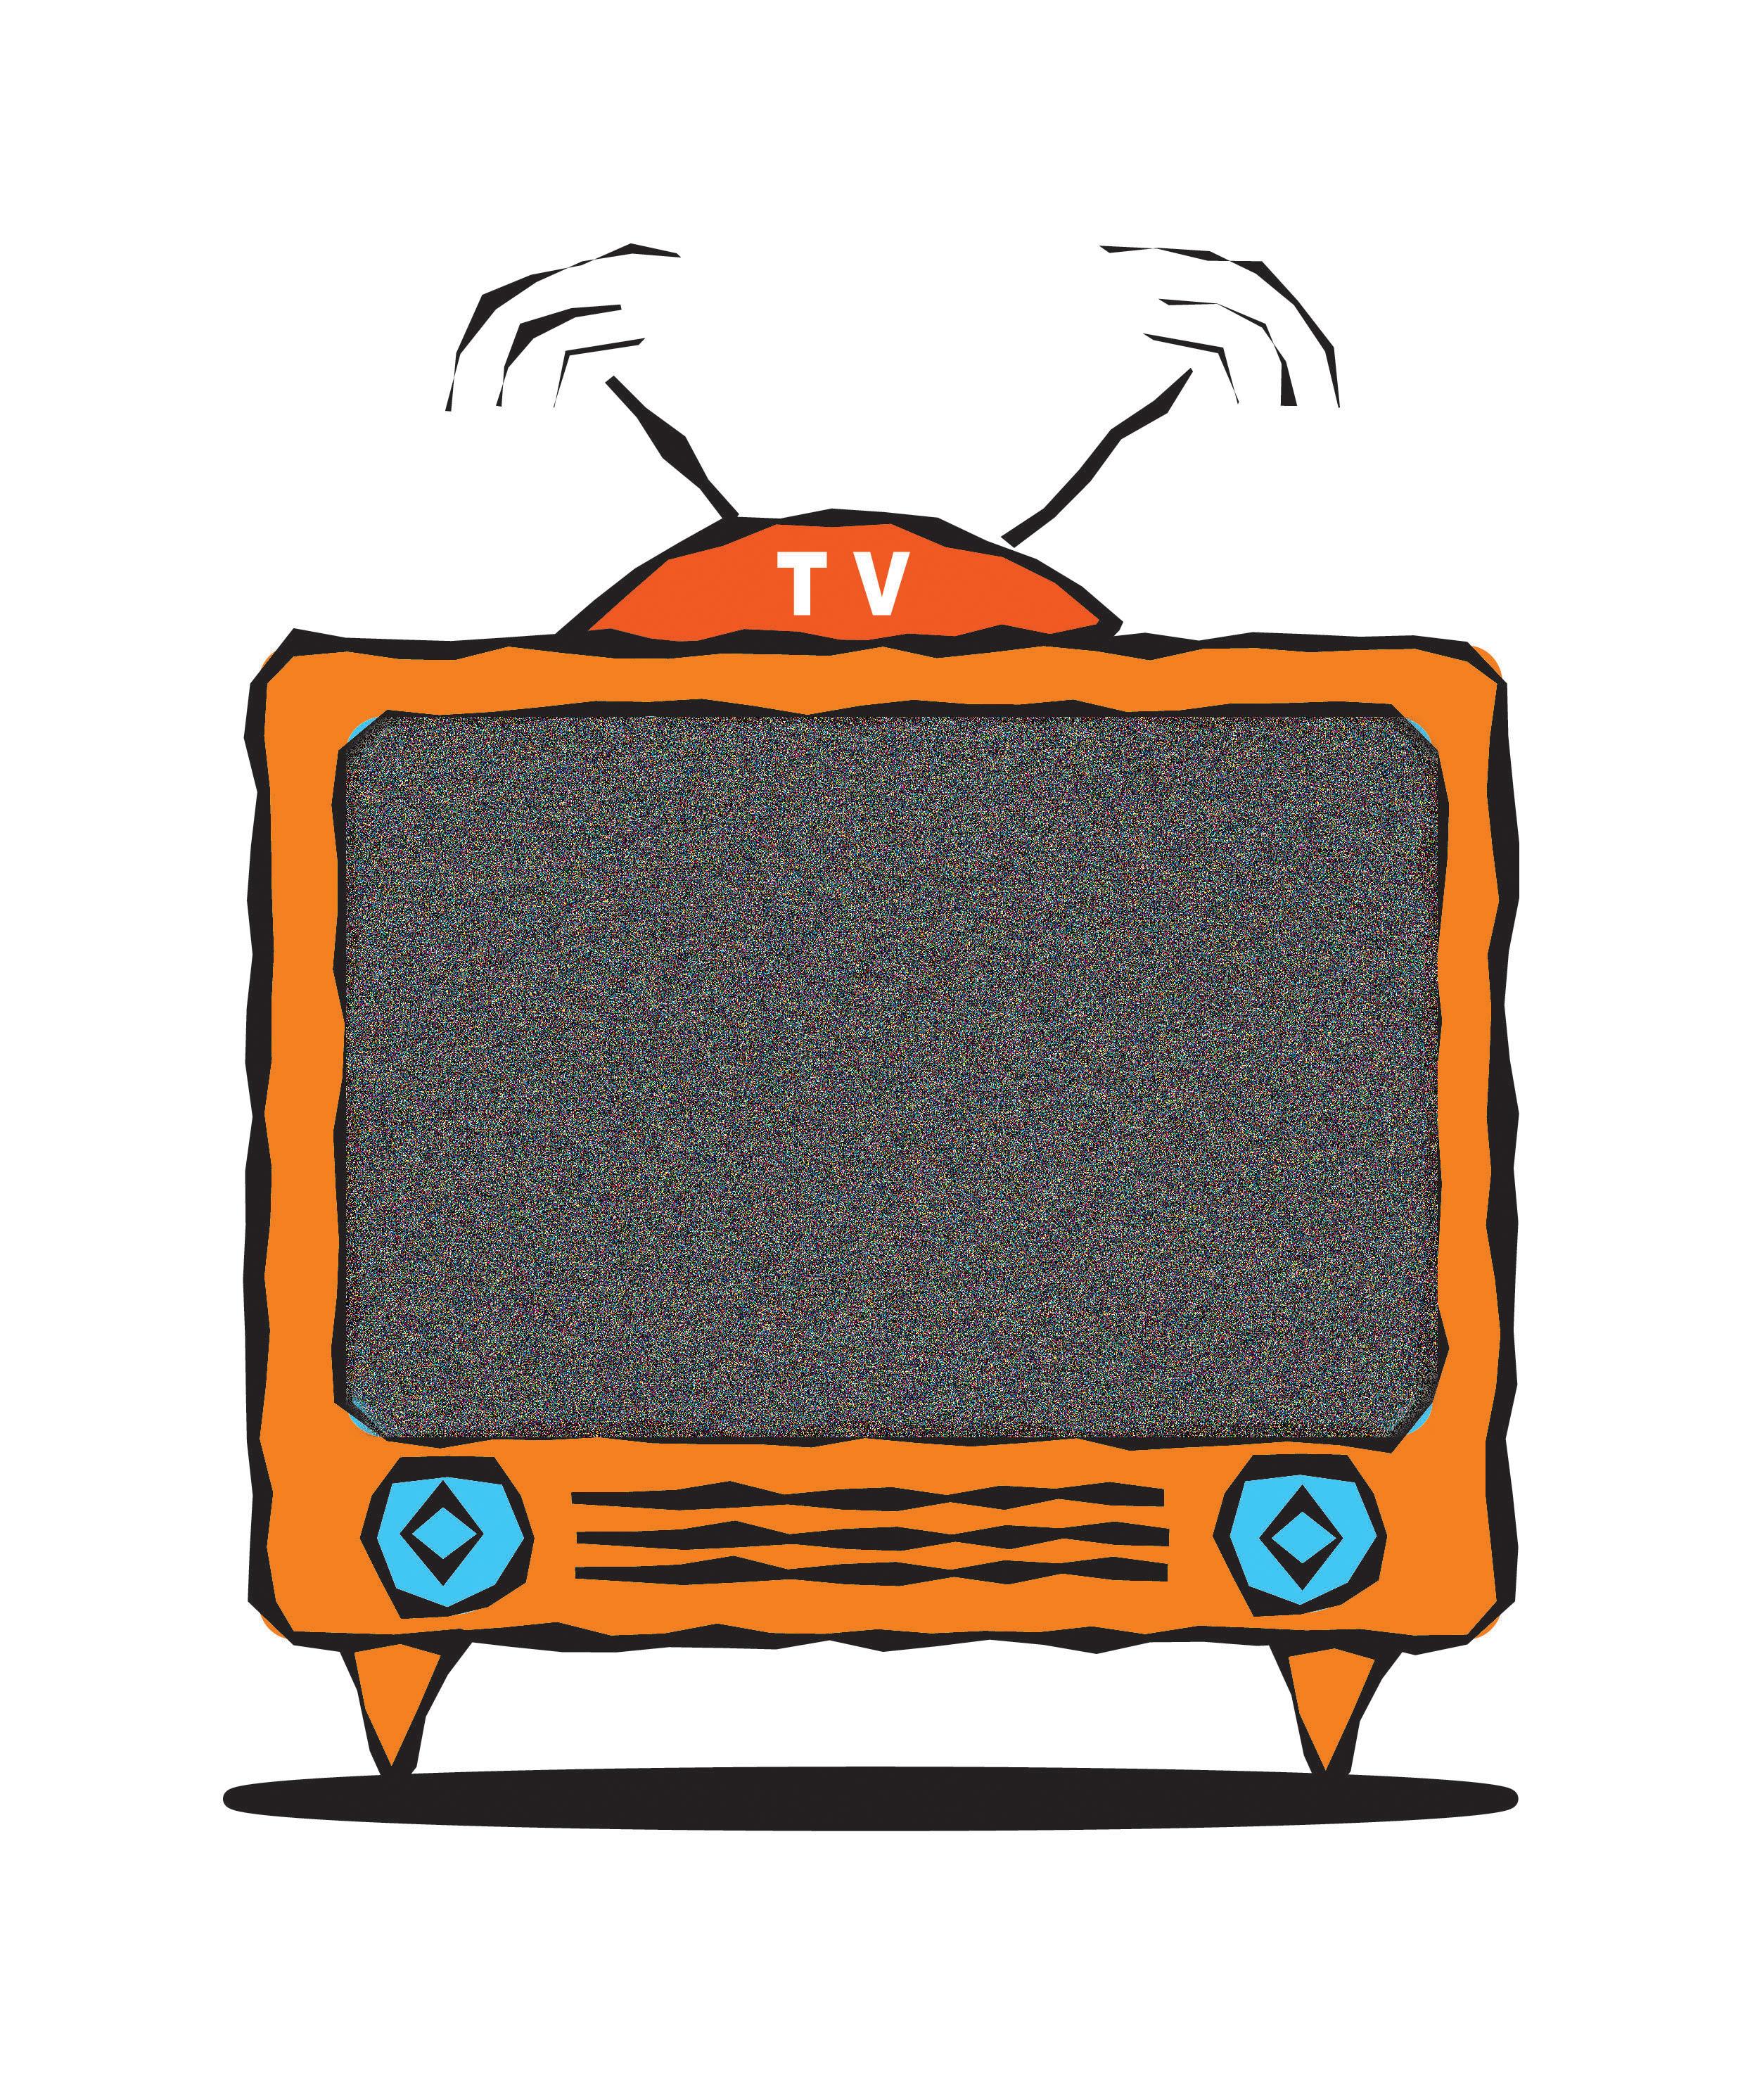 watch tv clipart idea image | clipart panda - free clipart images